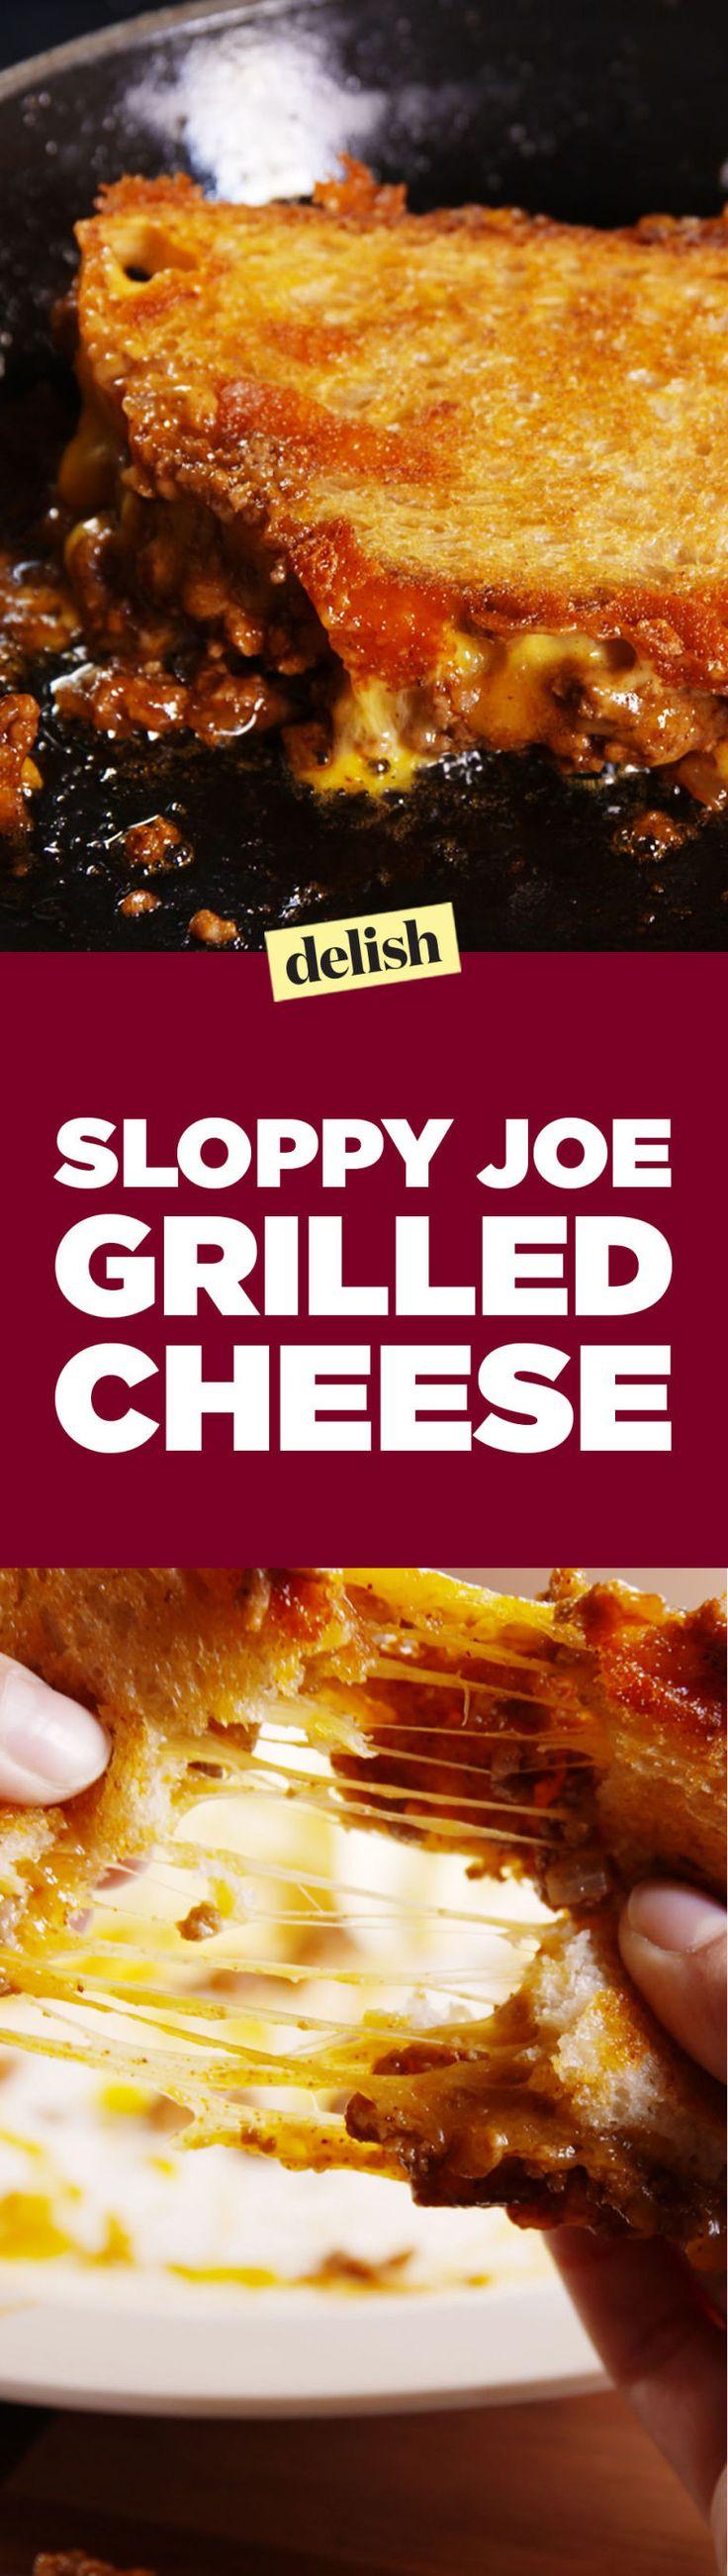 Sloppy Joe Grilled Cheese  - Delish.com